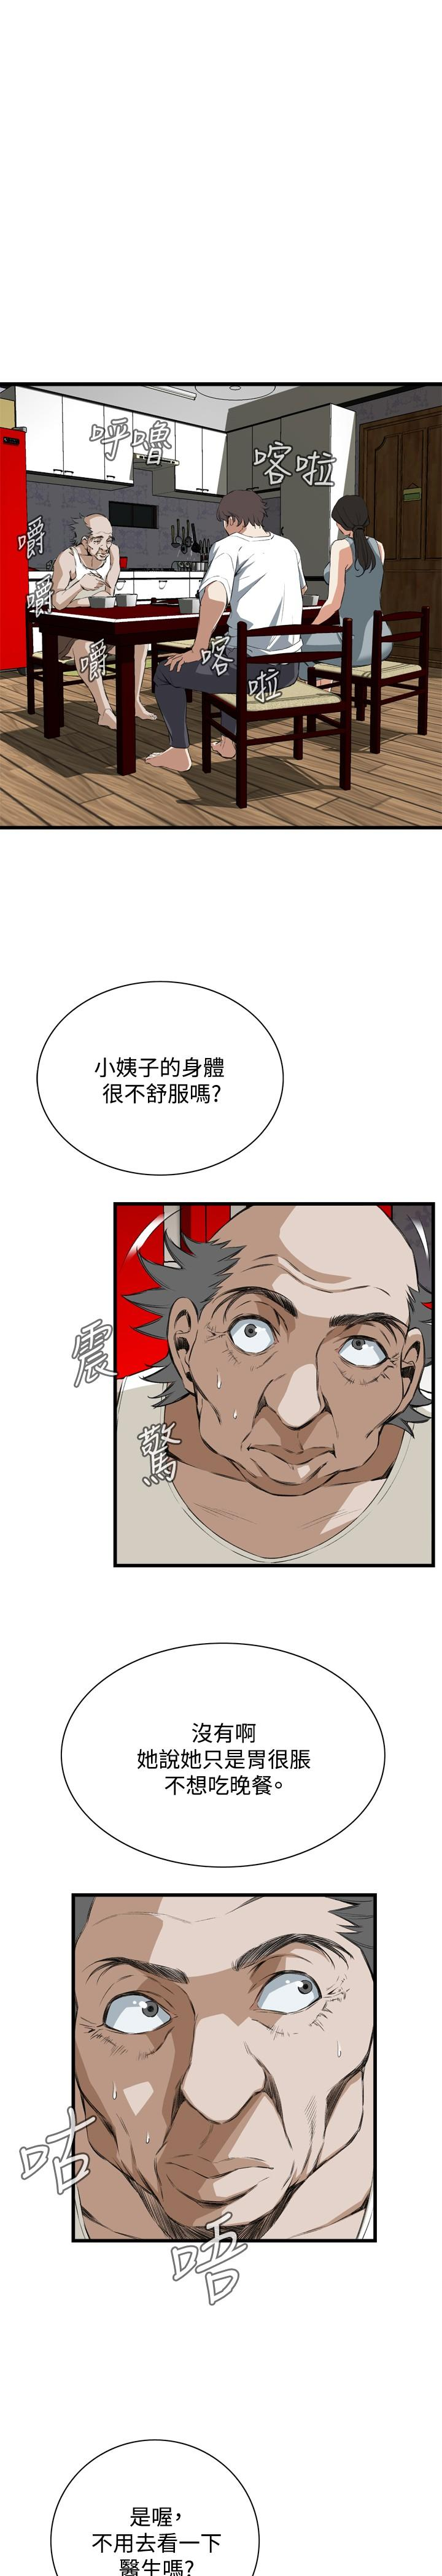 Take a Peek 偷窥 Ch.39~60 [Chinese]中文 384